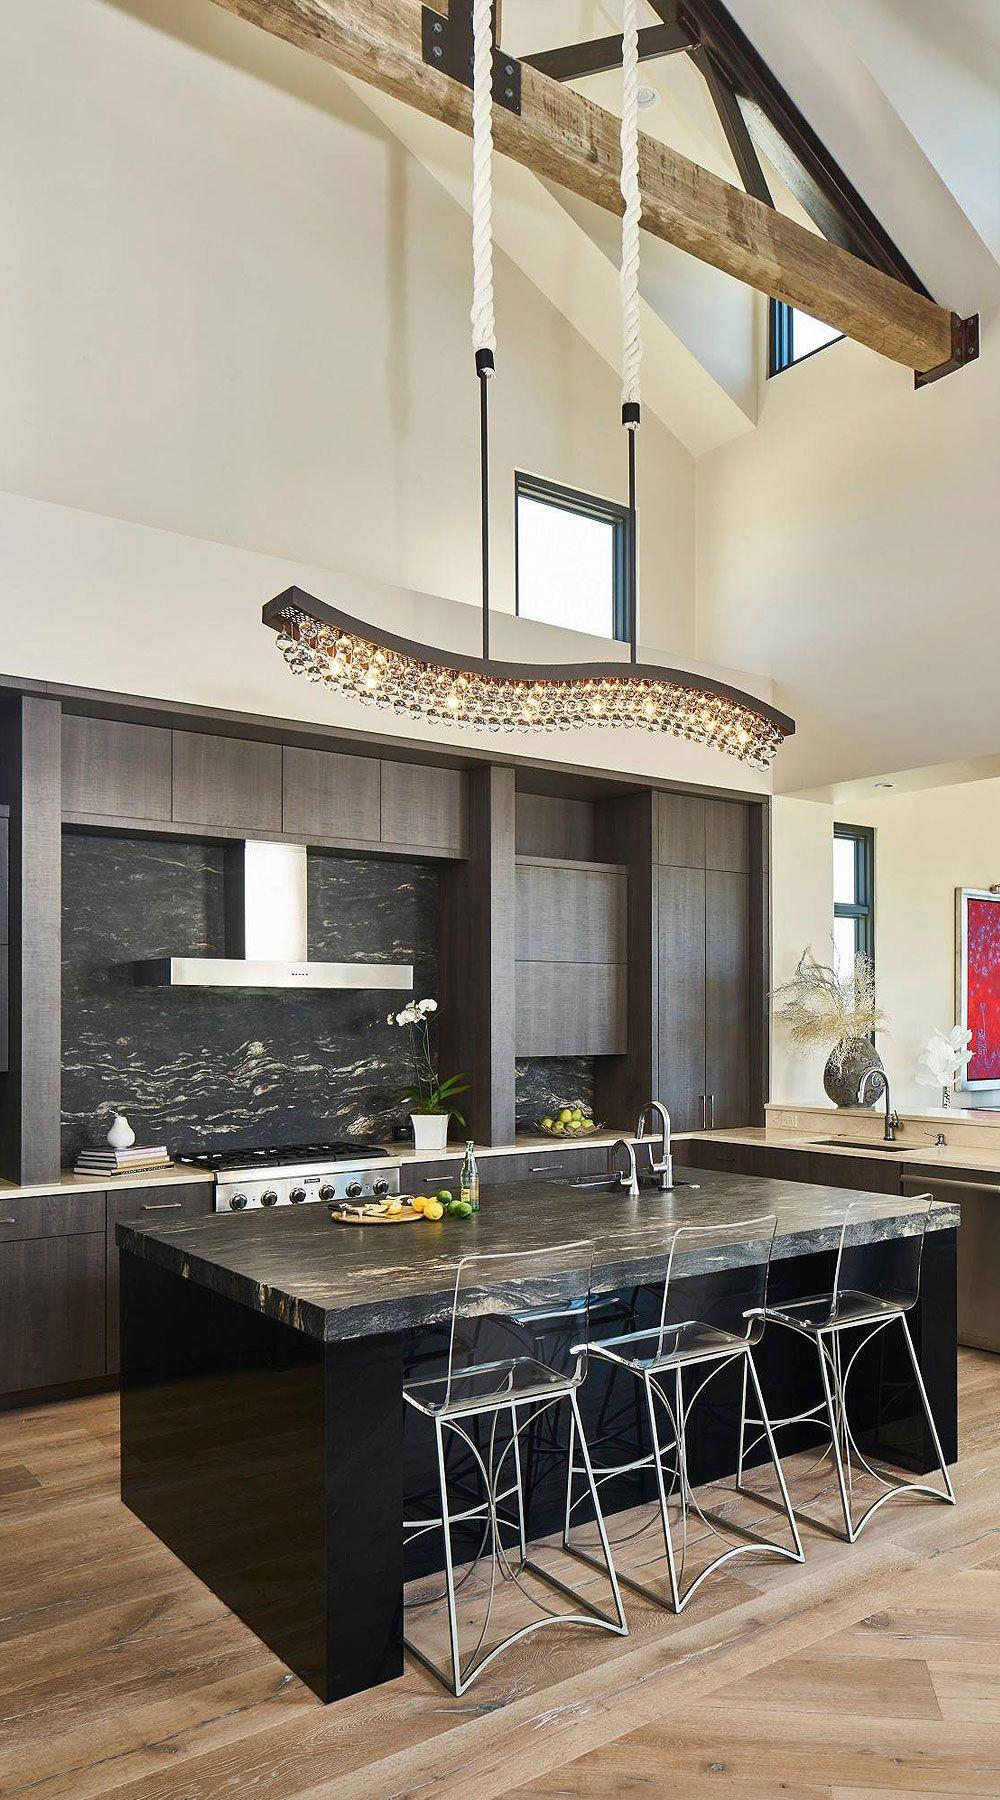 50+ Black Countertop Backsplash Ideas (Tile Designs, Tips ... on Backsplash Ideas For Black Granite Countertops  id=69720